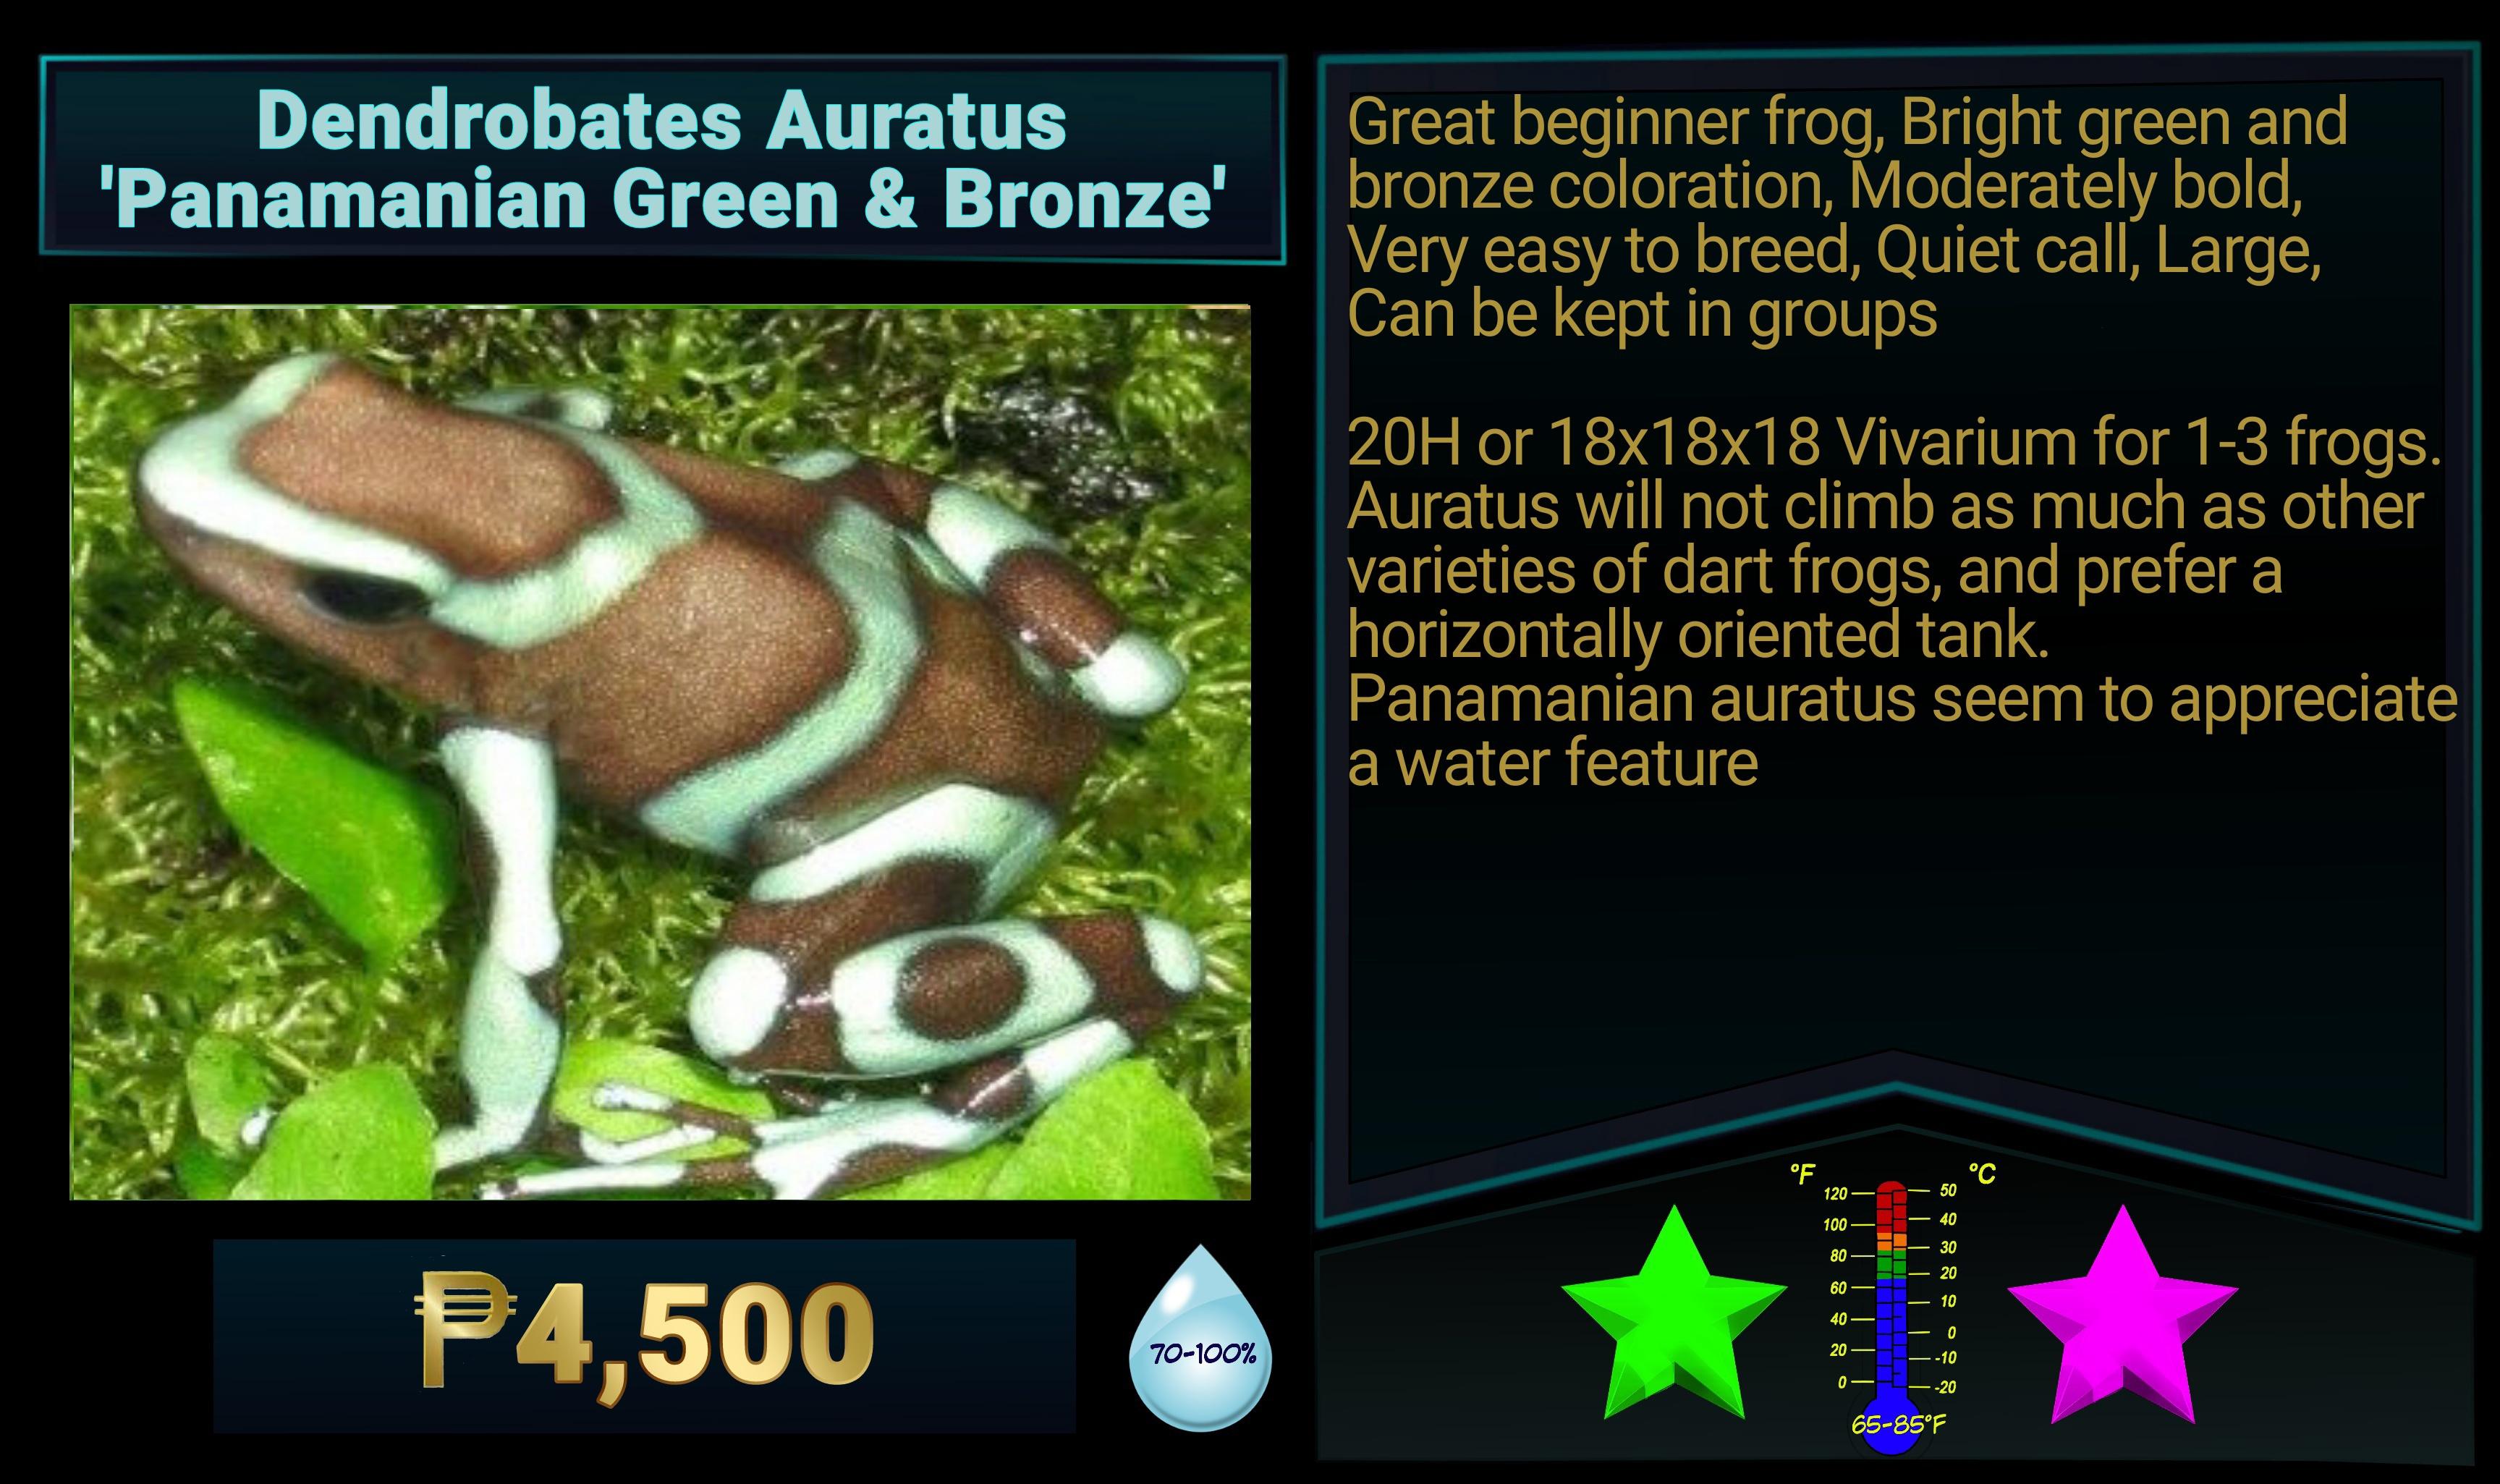 Dendrobates auratus Panamanian Green and Bronze